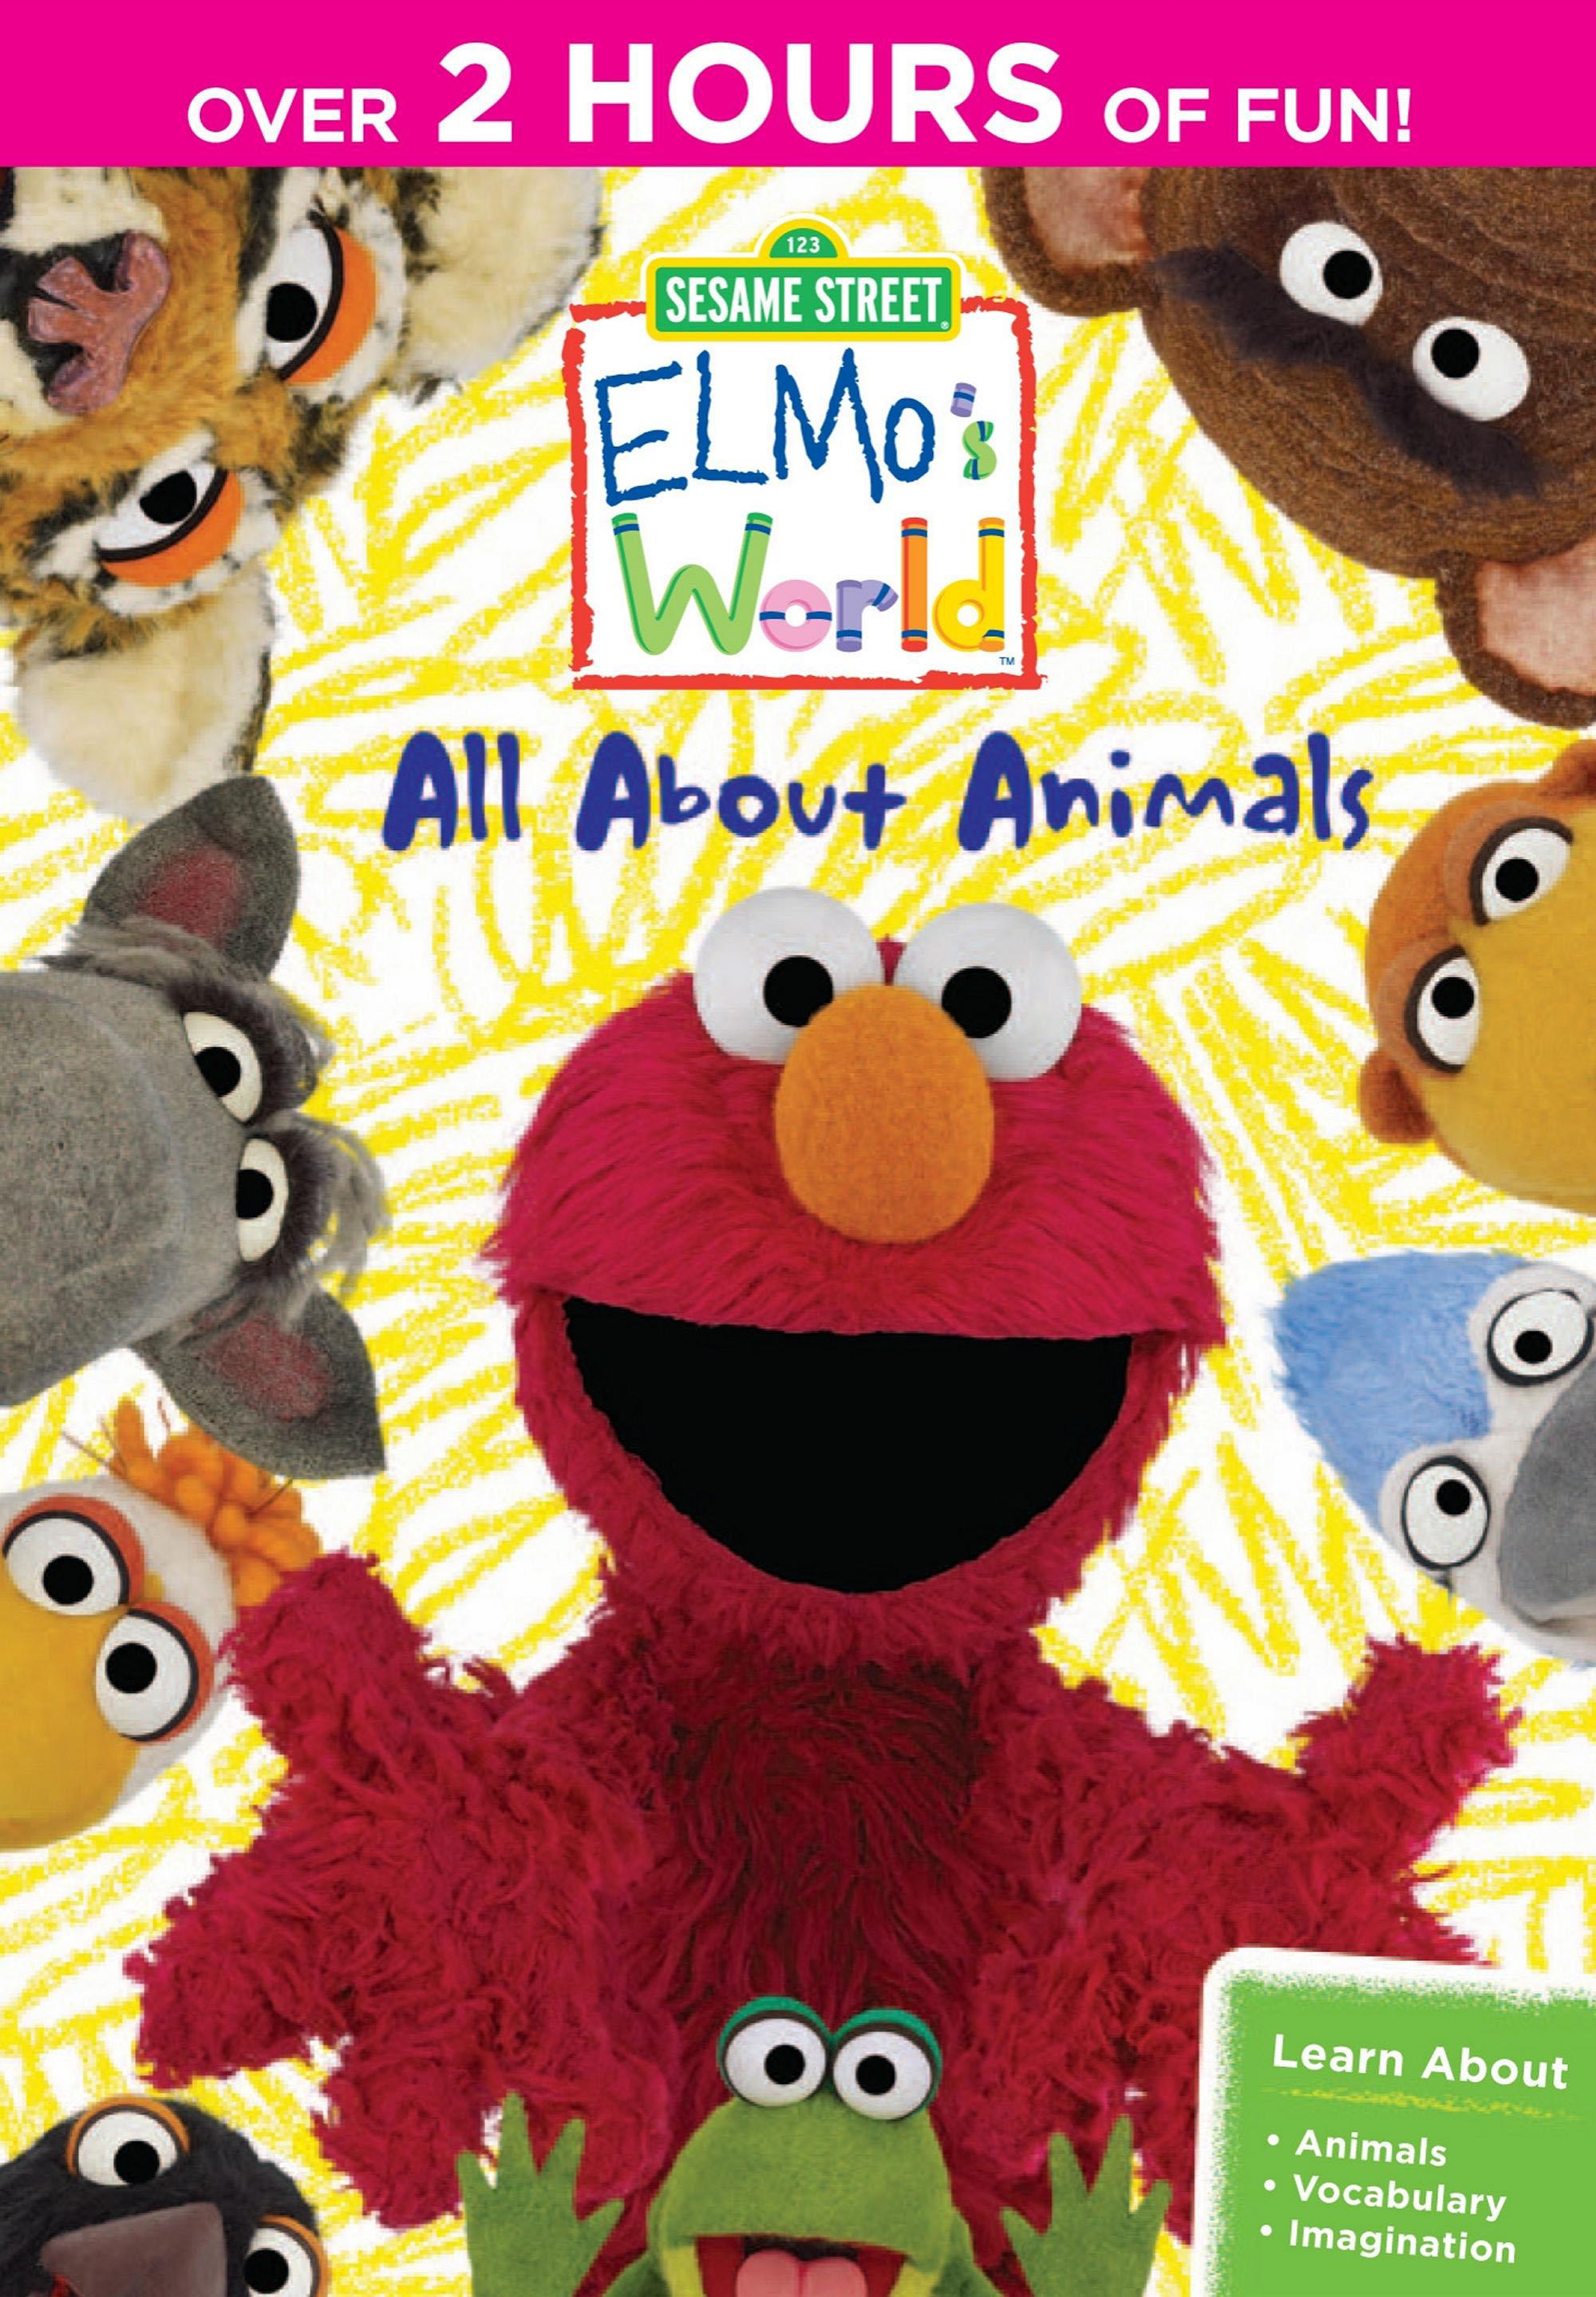 Sesame Street: Elmo's World - All About Animals